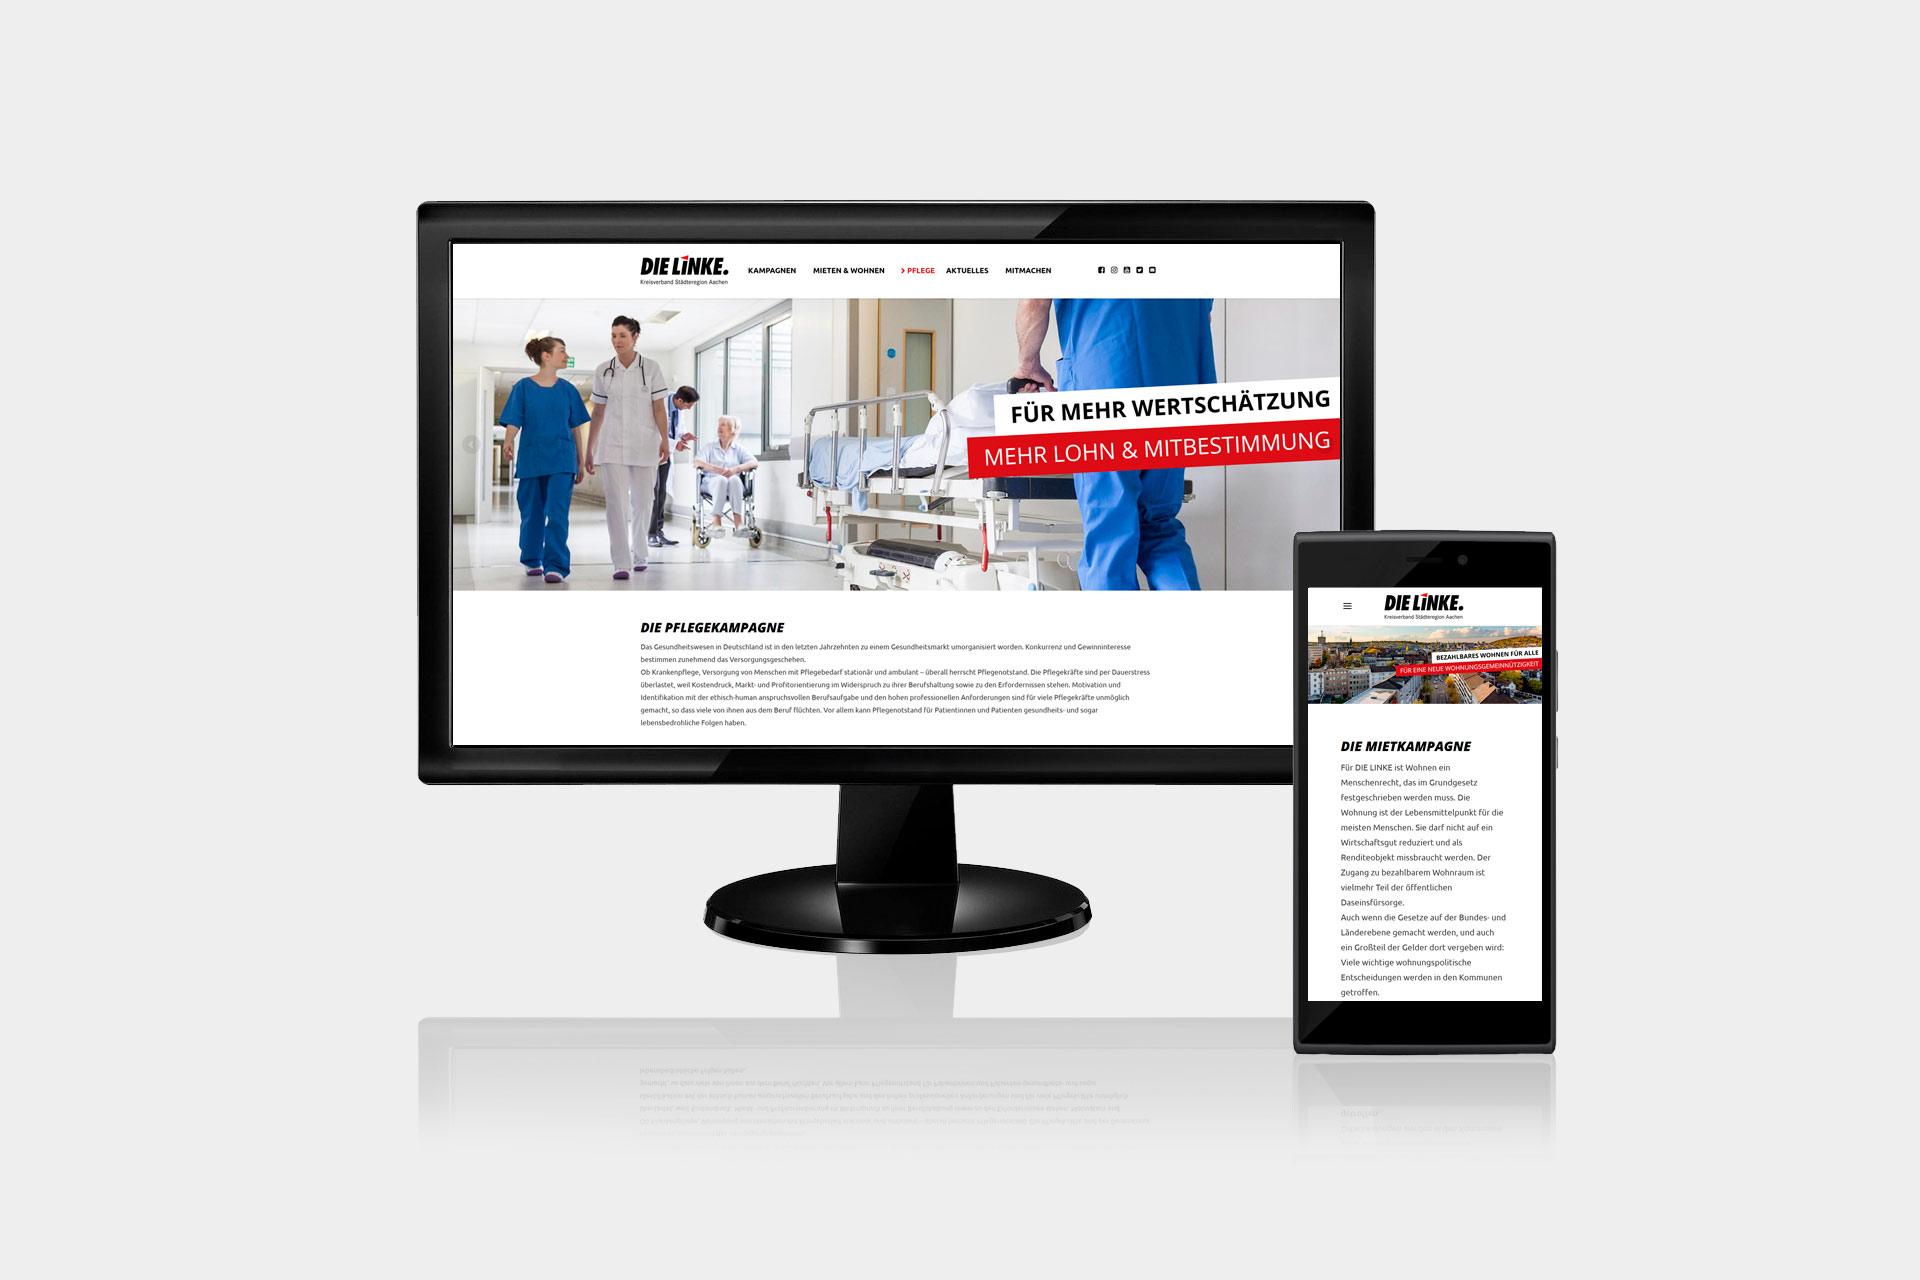 webdesign-dielinke-kampagne